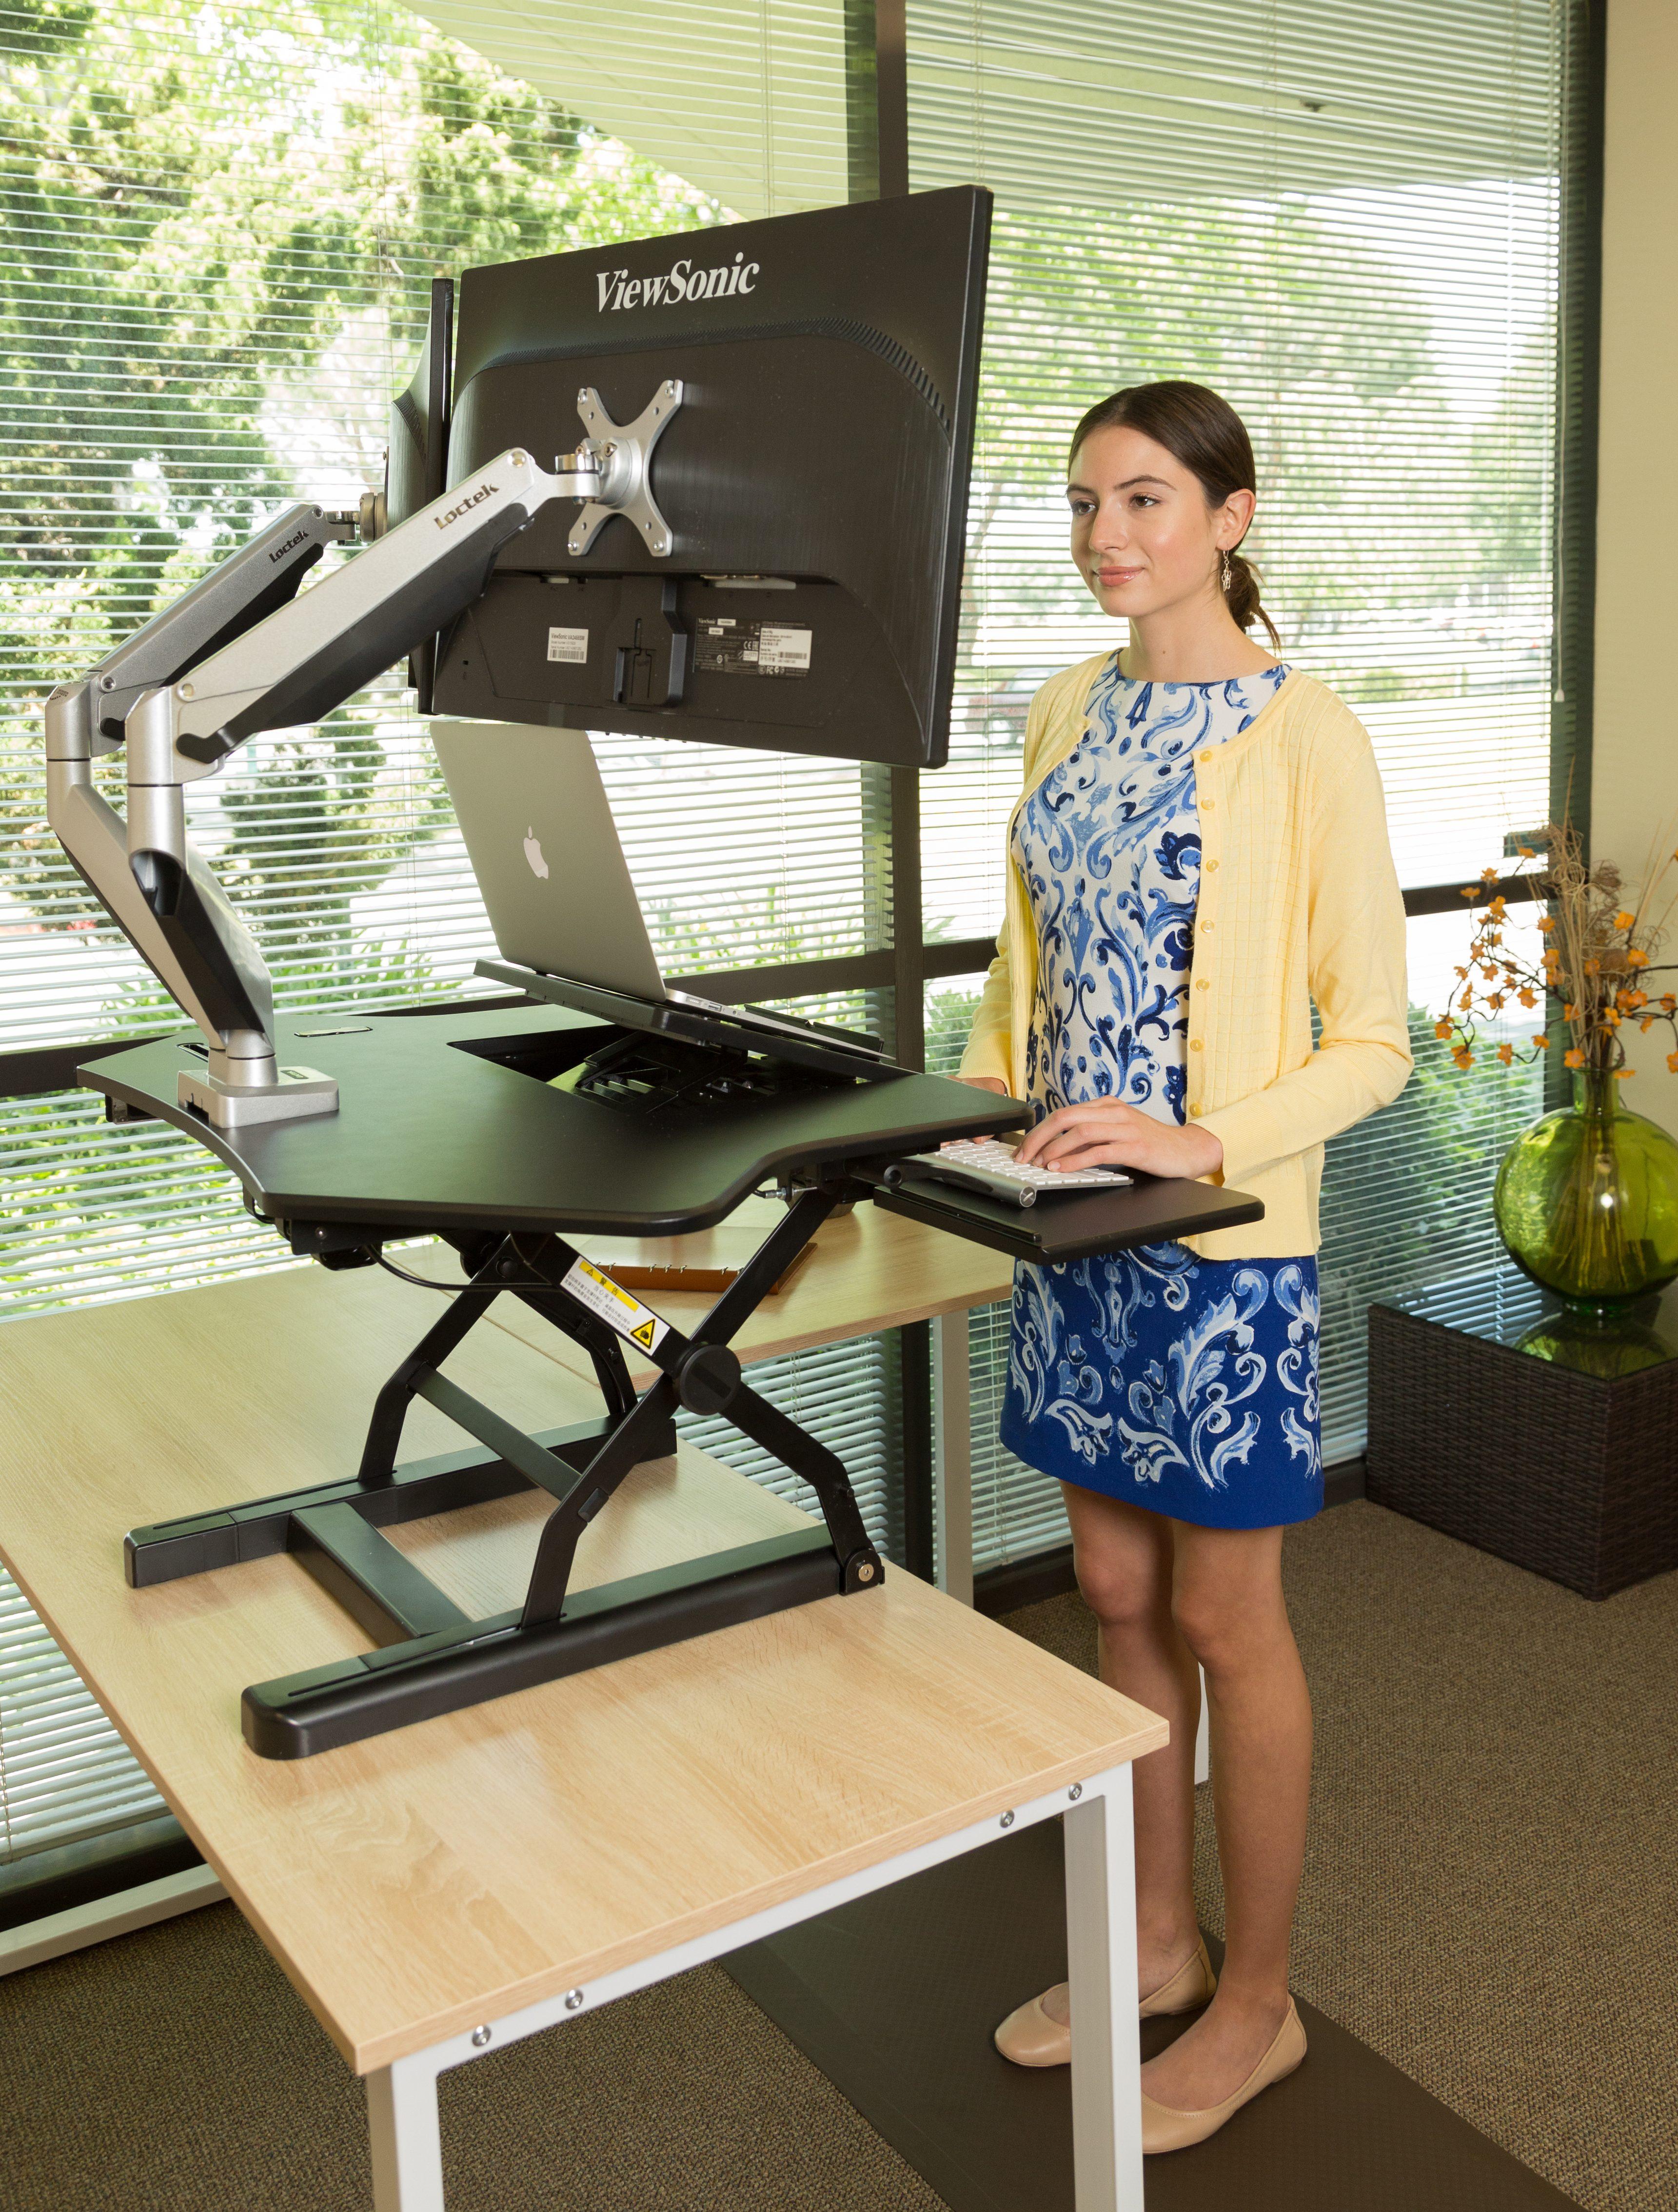 Loctek PC36 sit-stand desktop riser